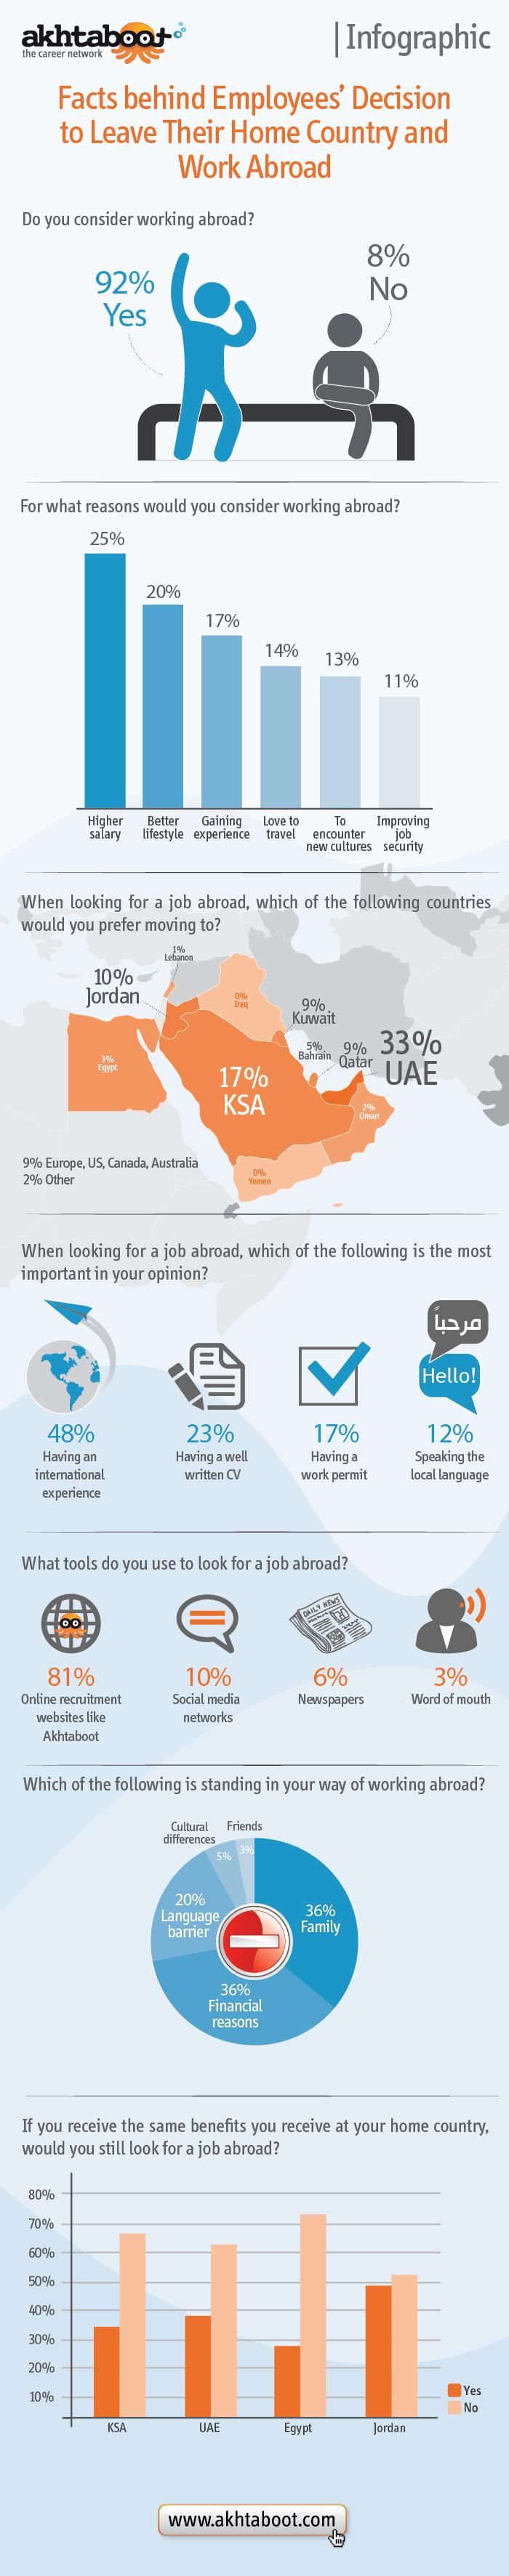 infographic_2013-Q4